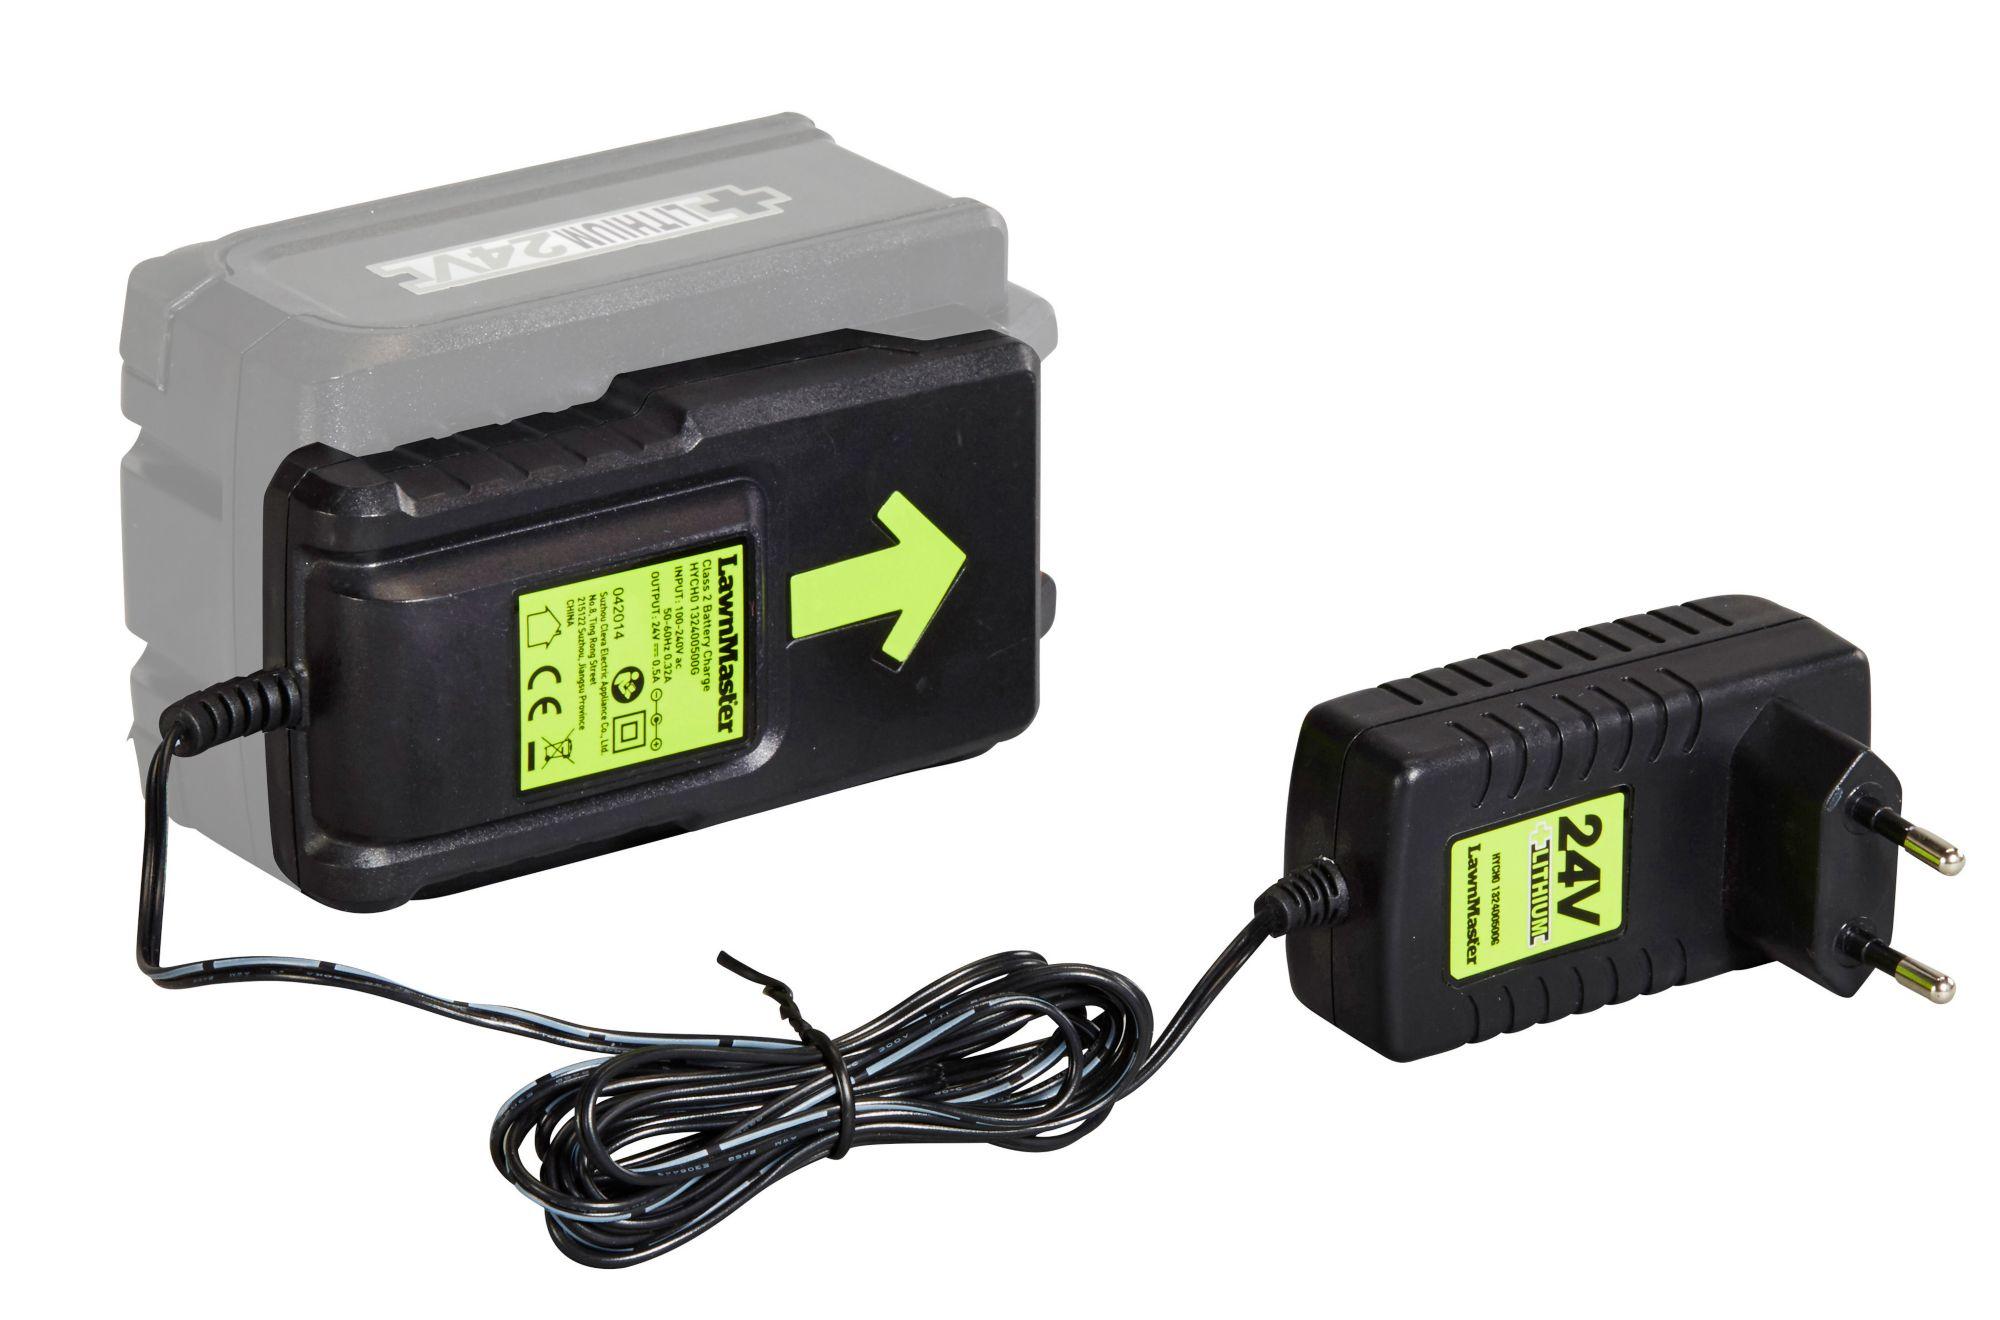 GRIZZLY Grizzly 24V Schnell-Ladegerät für 2,0 Ah oder 4,0 Ah Akkus, 24-Volt-Akku-System